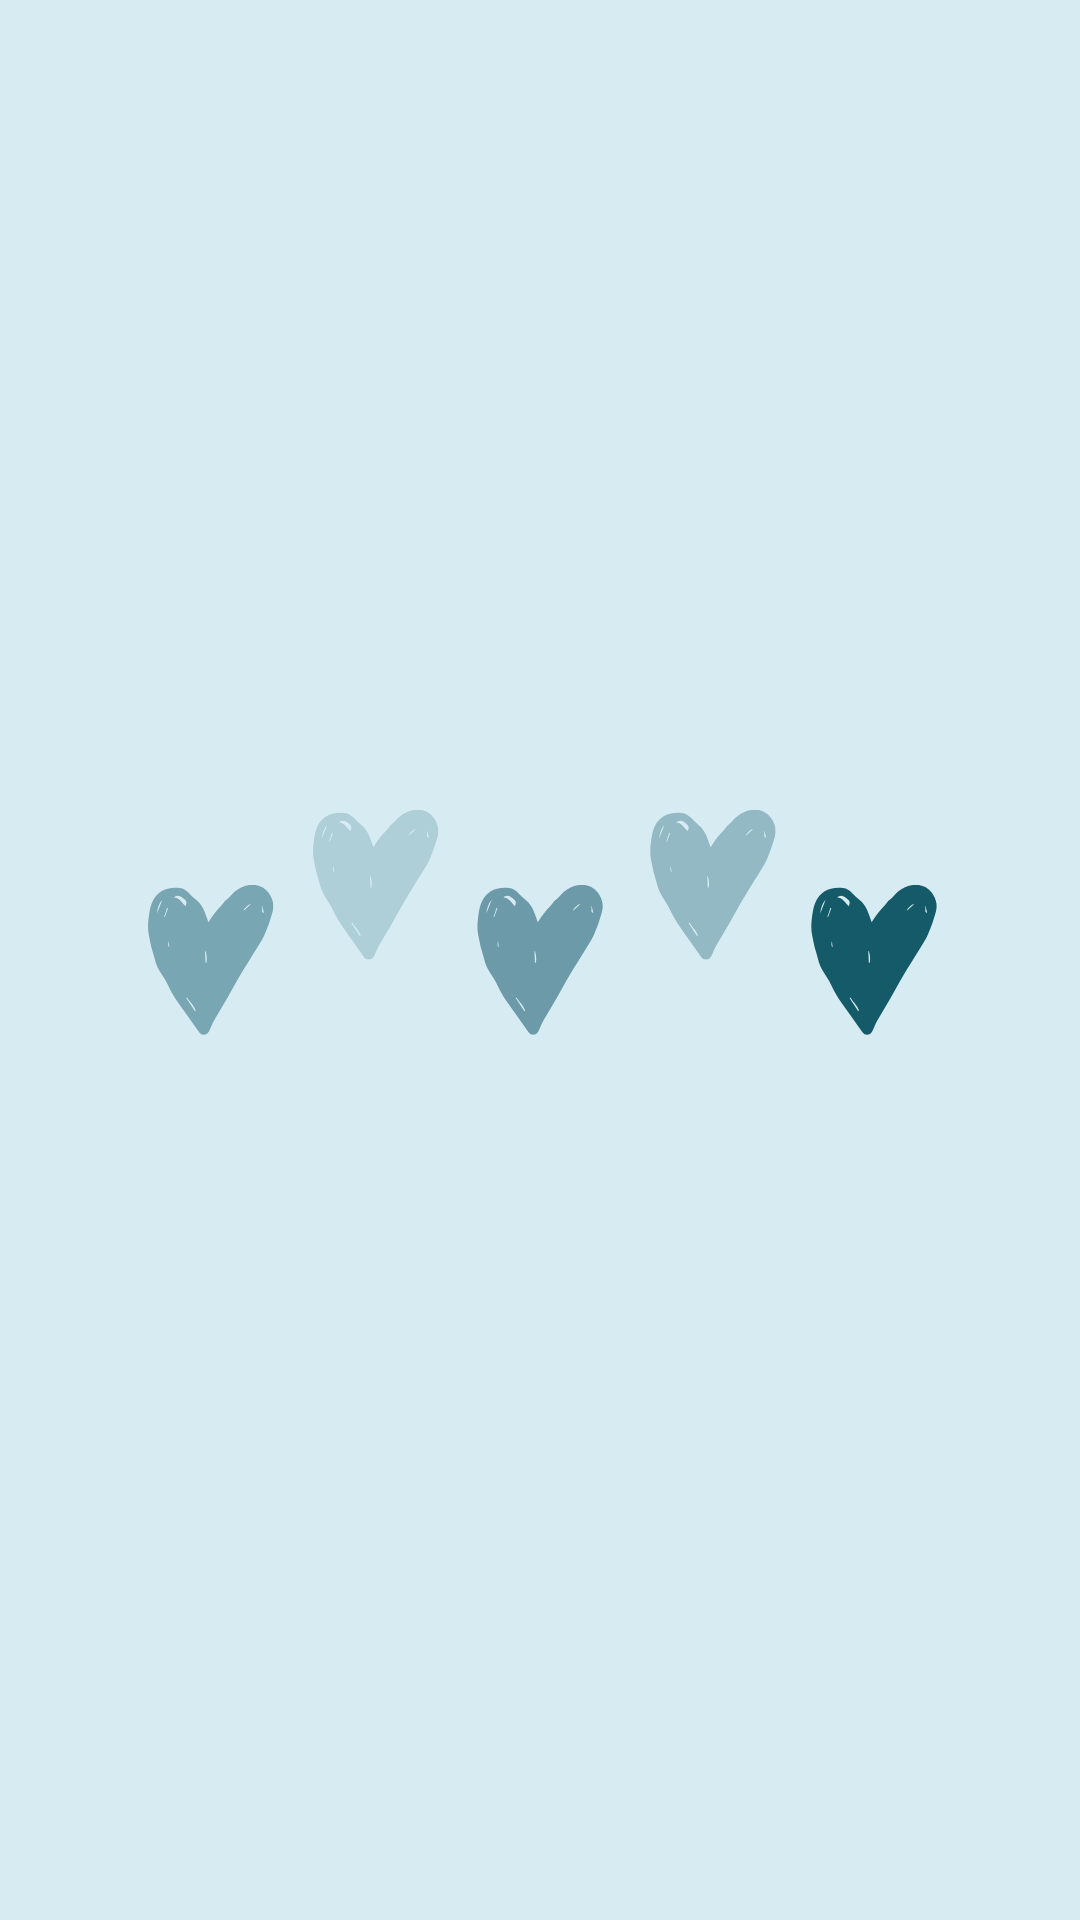 Blue Aesthetic Wallpaper In 2020 Blue Wallpaper Iphone Iphone Wallpaper Tumblr Aesthetic Blue Aesthetic Pastel